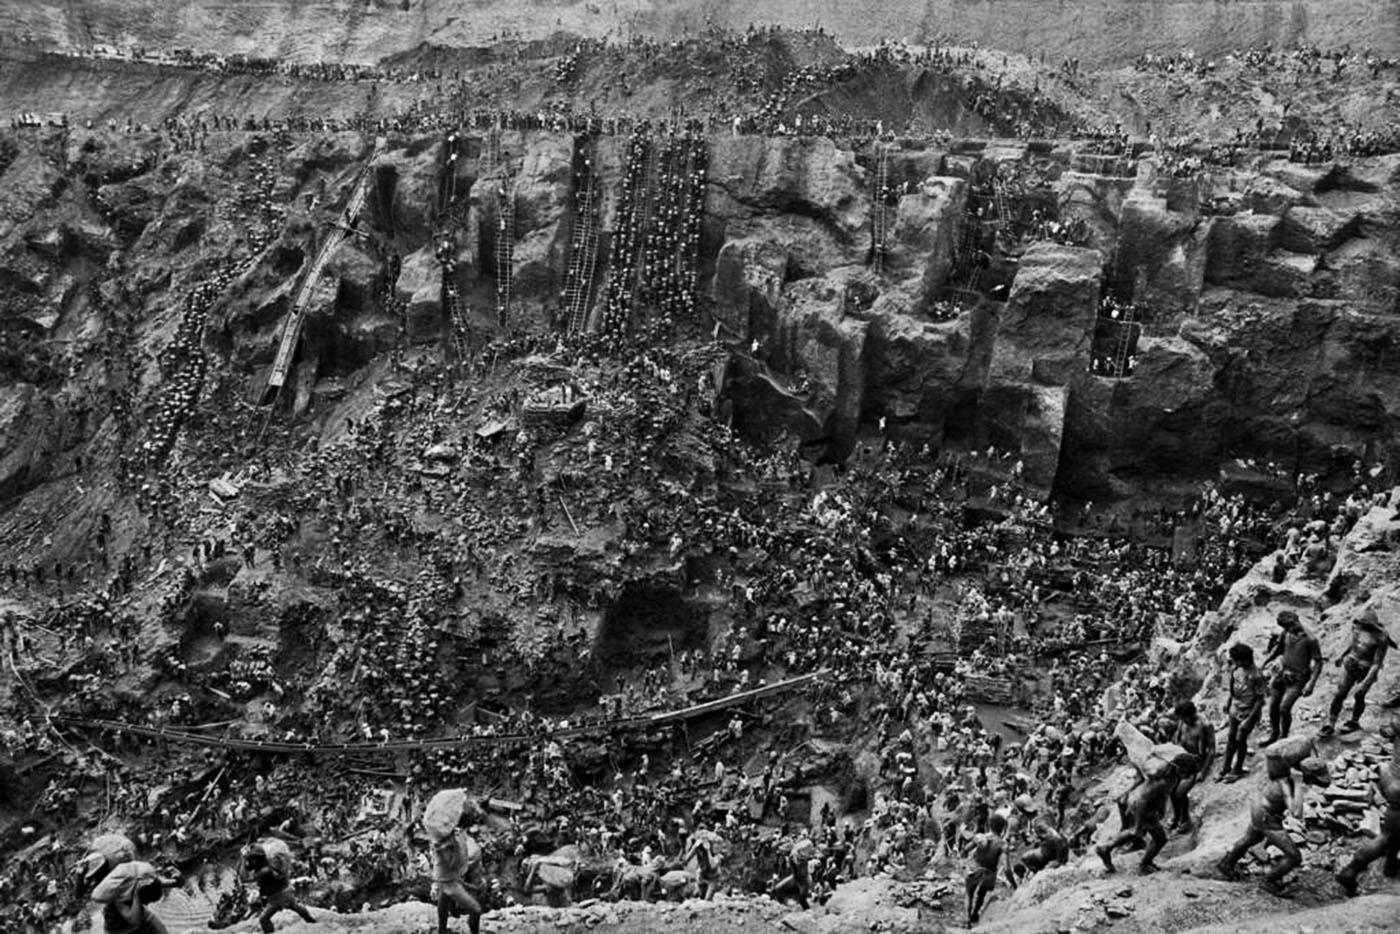 The hell of Sierra Pelada mines, 1980s 1